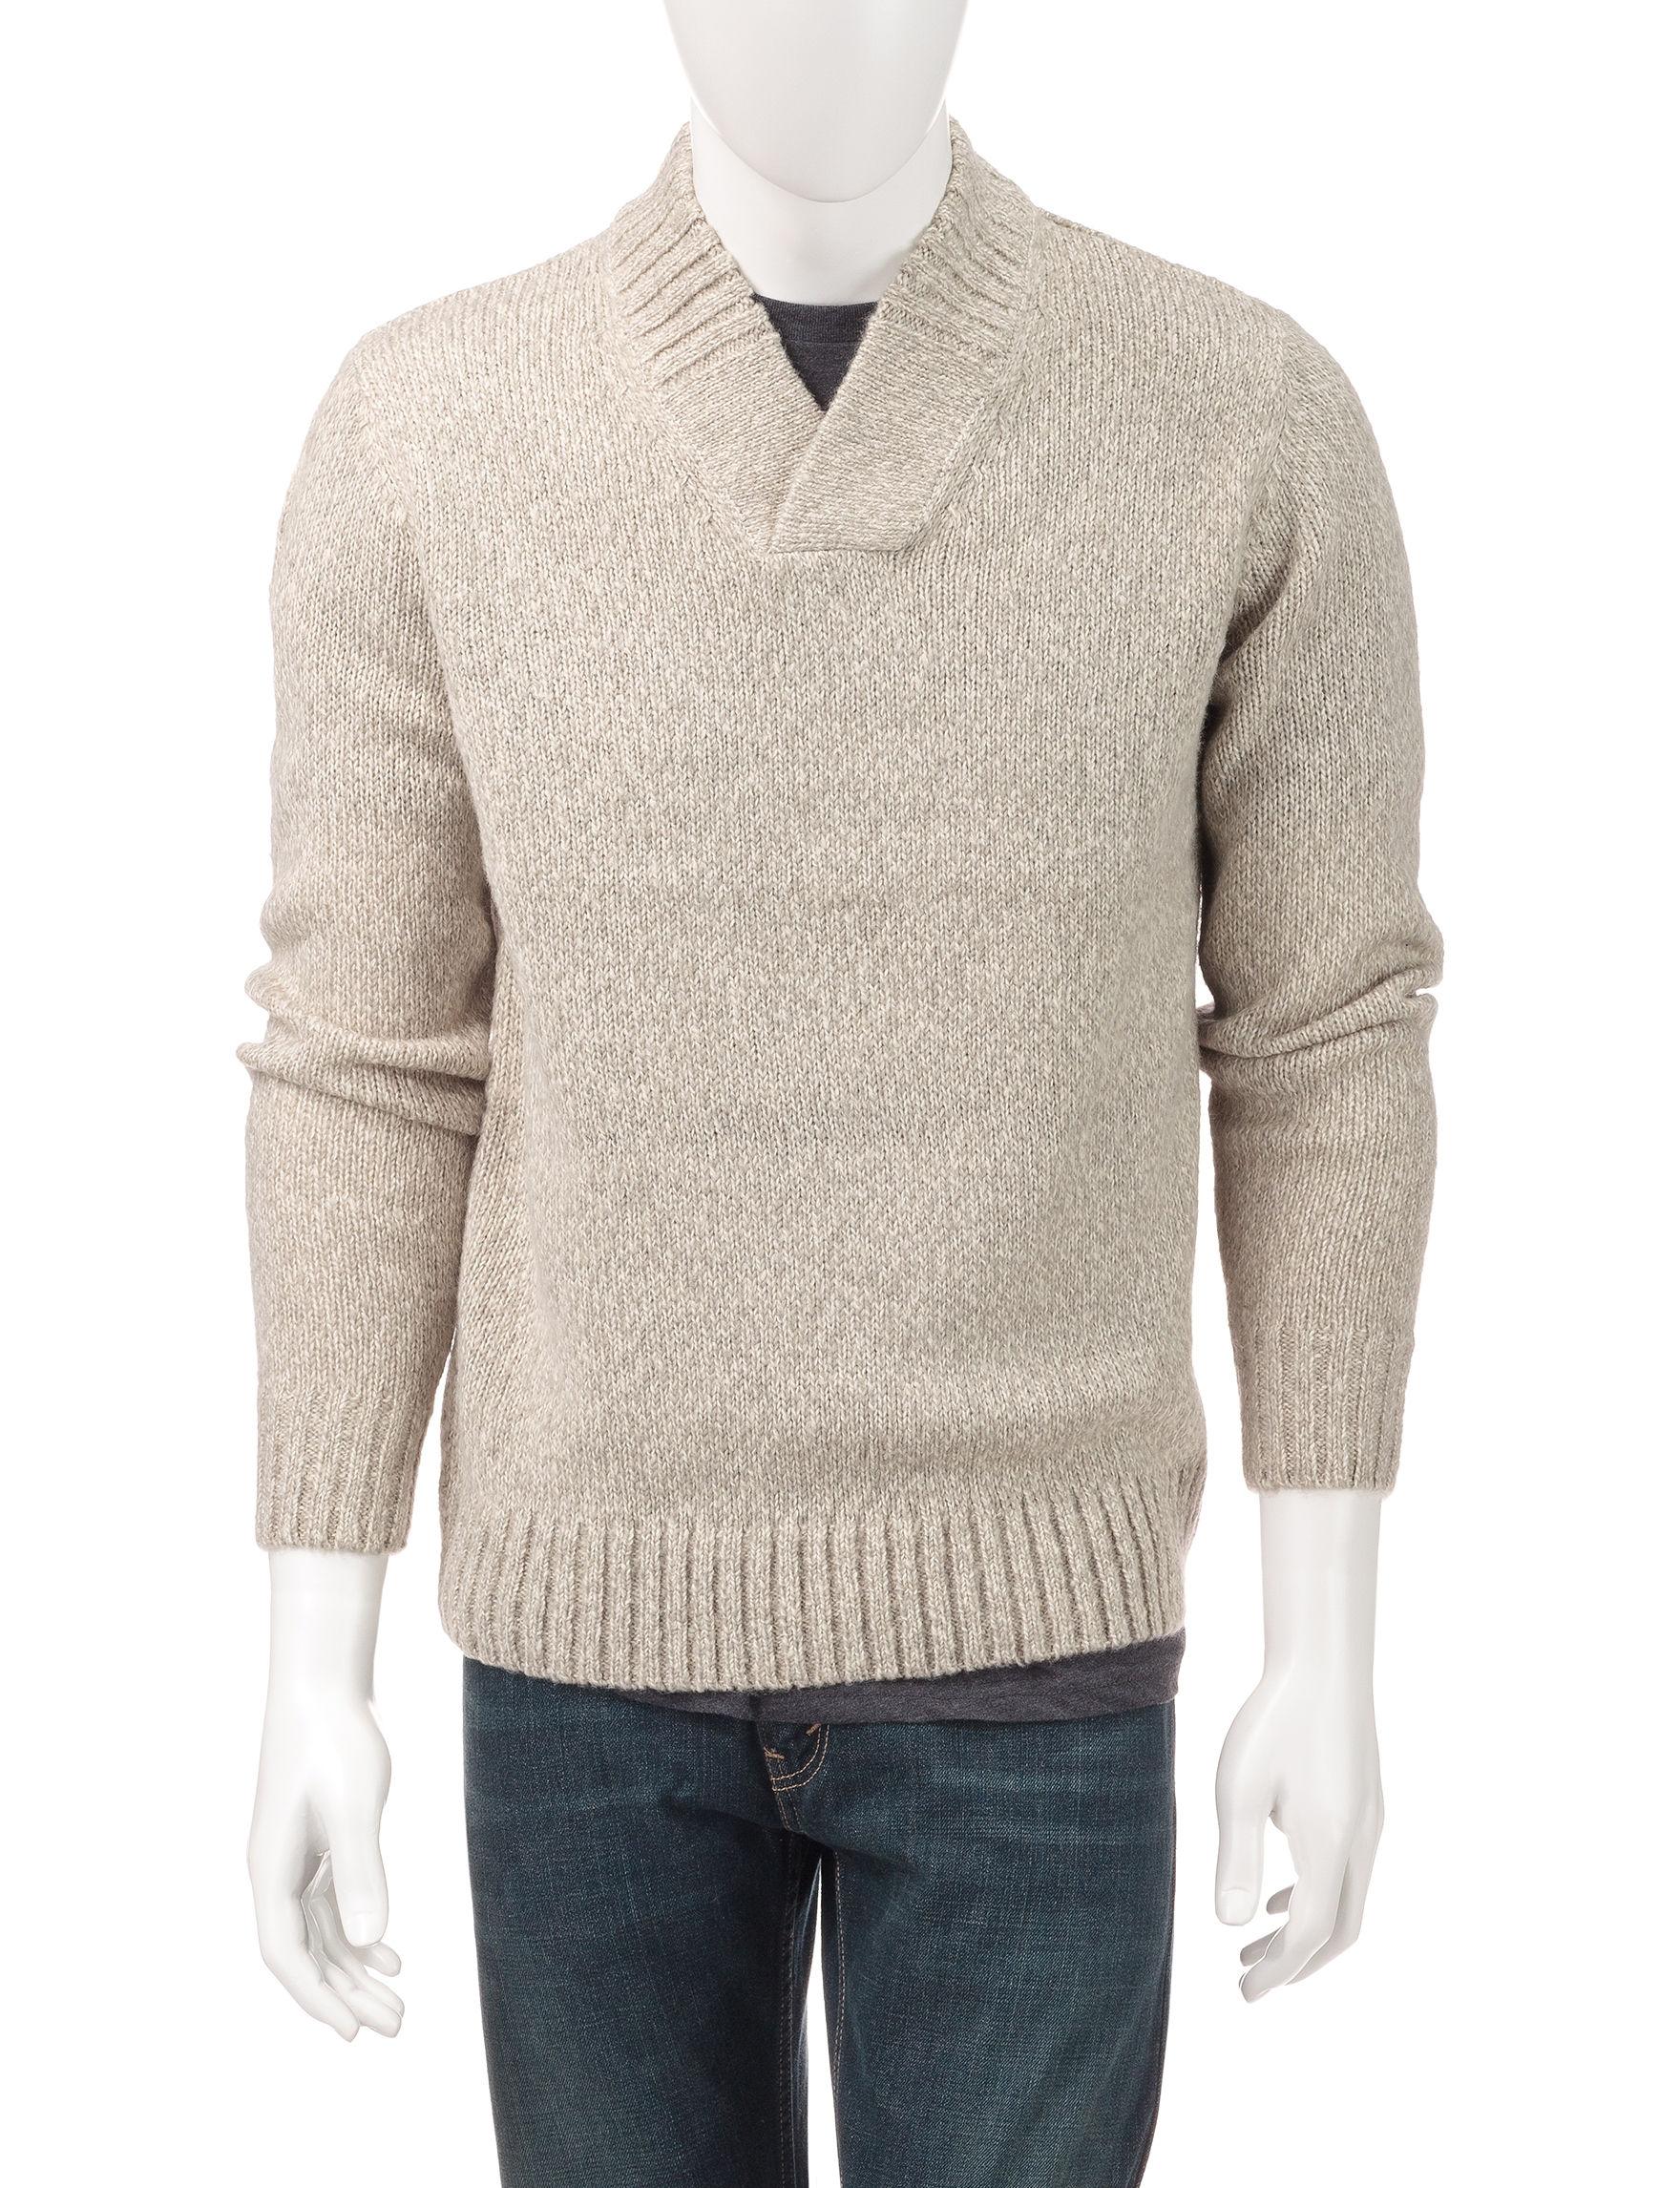 Axist Bone Dress Shirts Sweaters